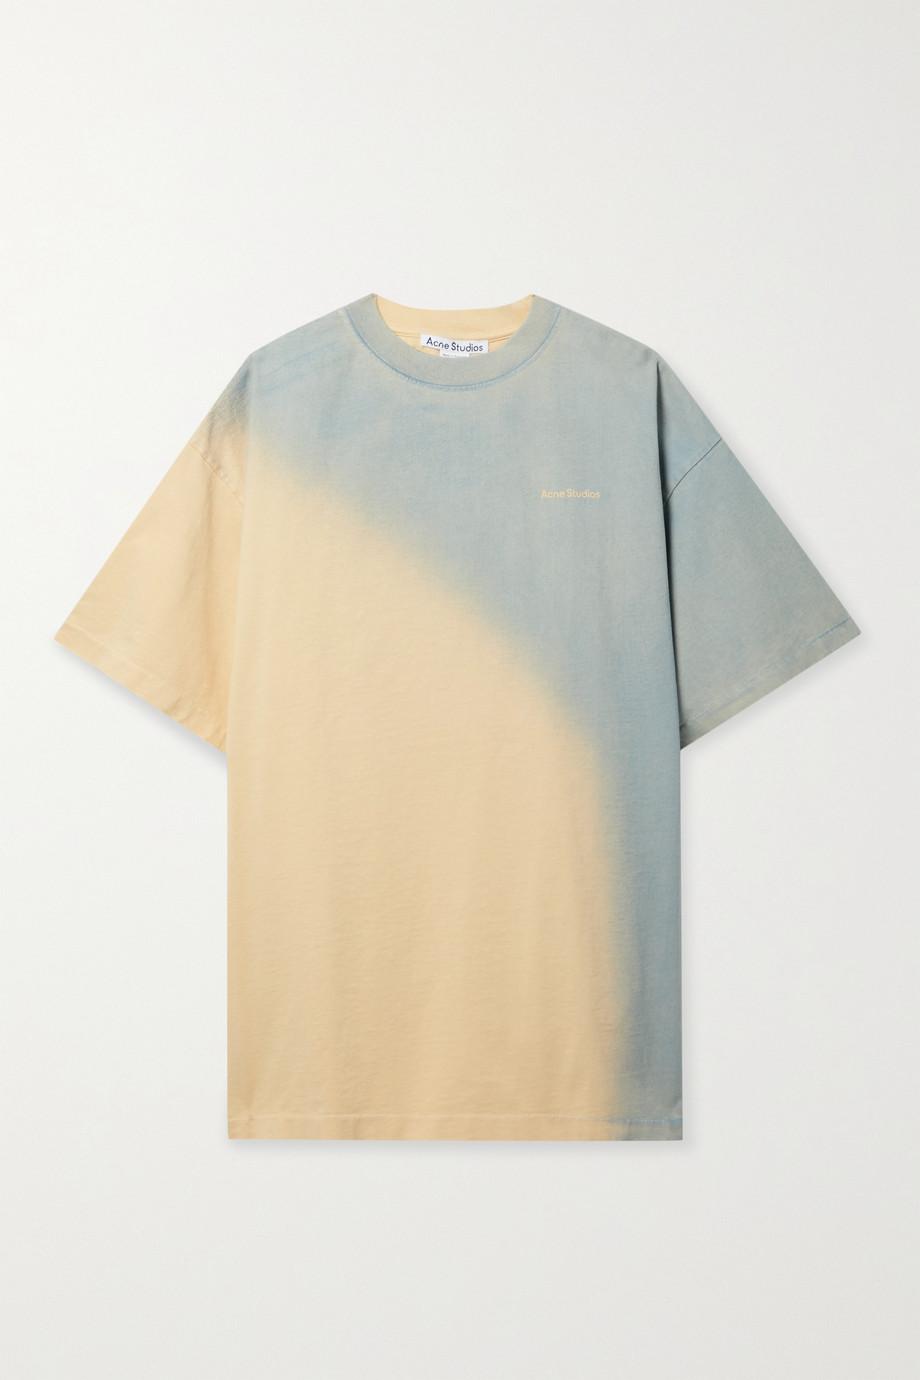 Acne Studios + NET SUSTAIN oversized ombré organic cotton-jersey T-shirt